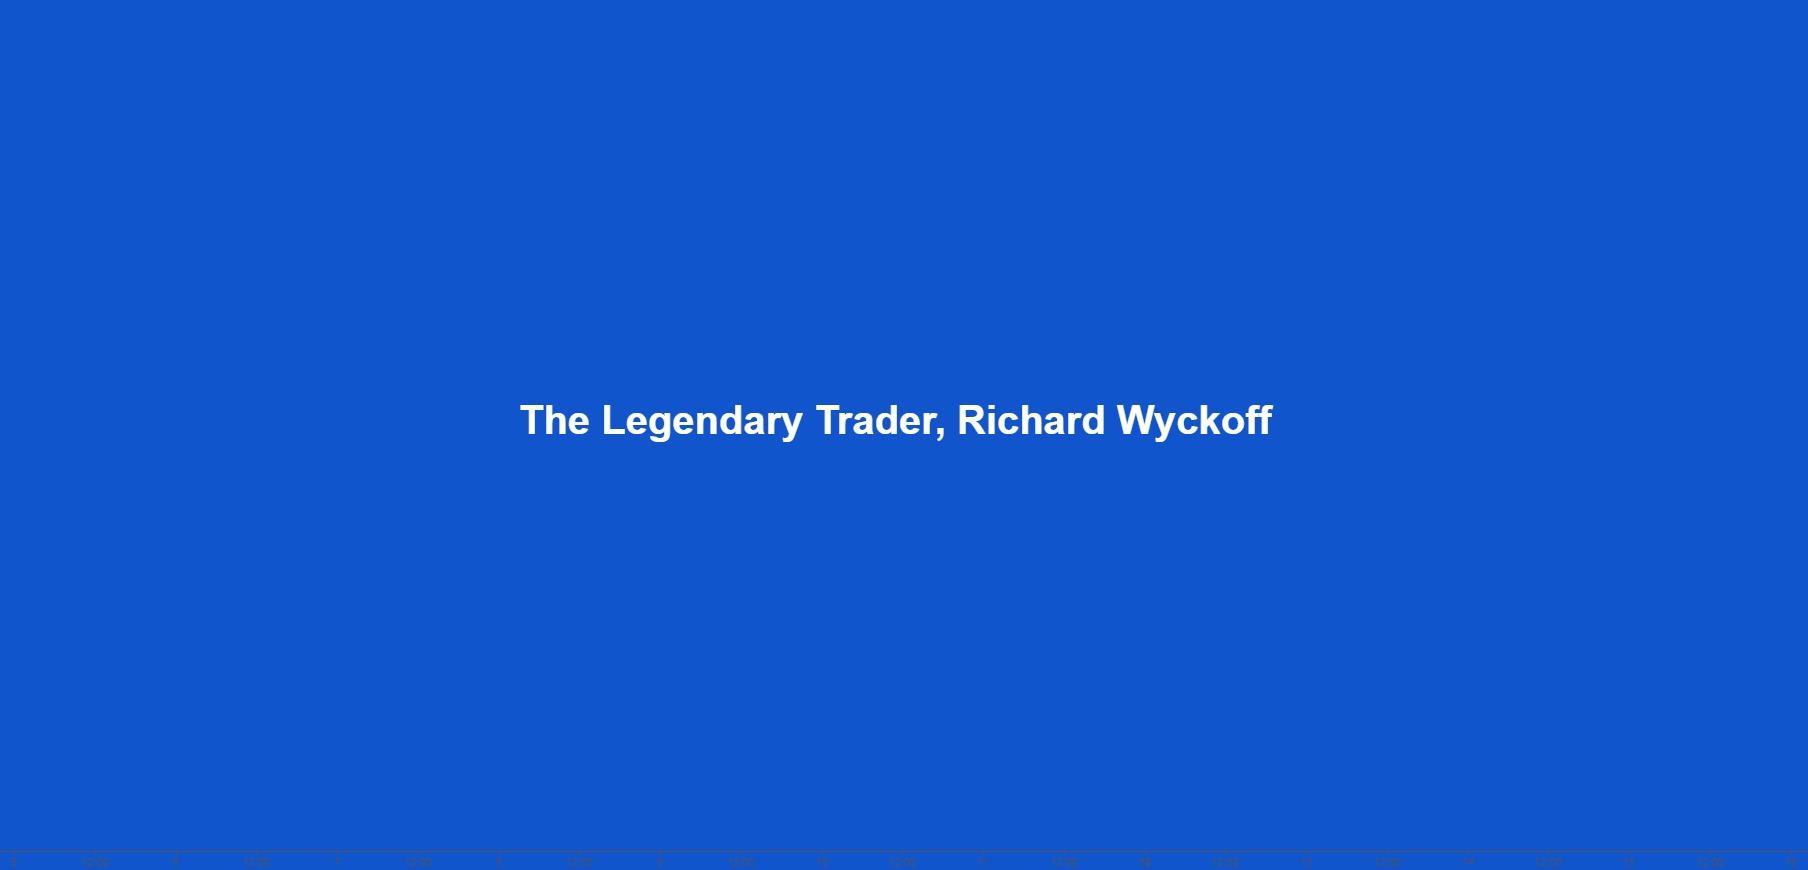 The Legendary Trader, Richard Wyckoff